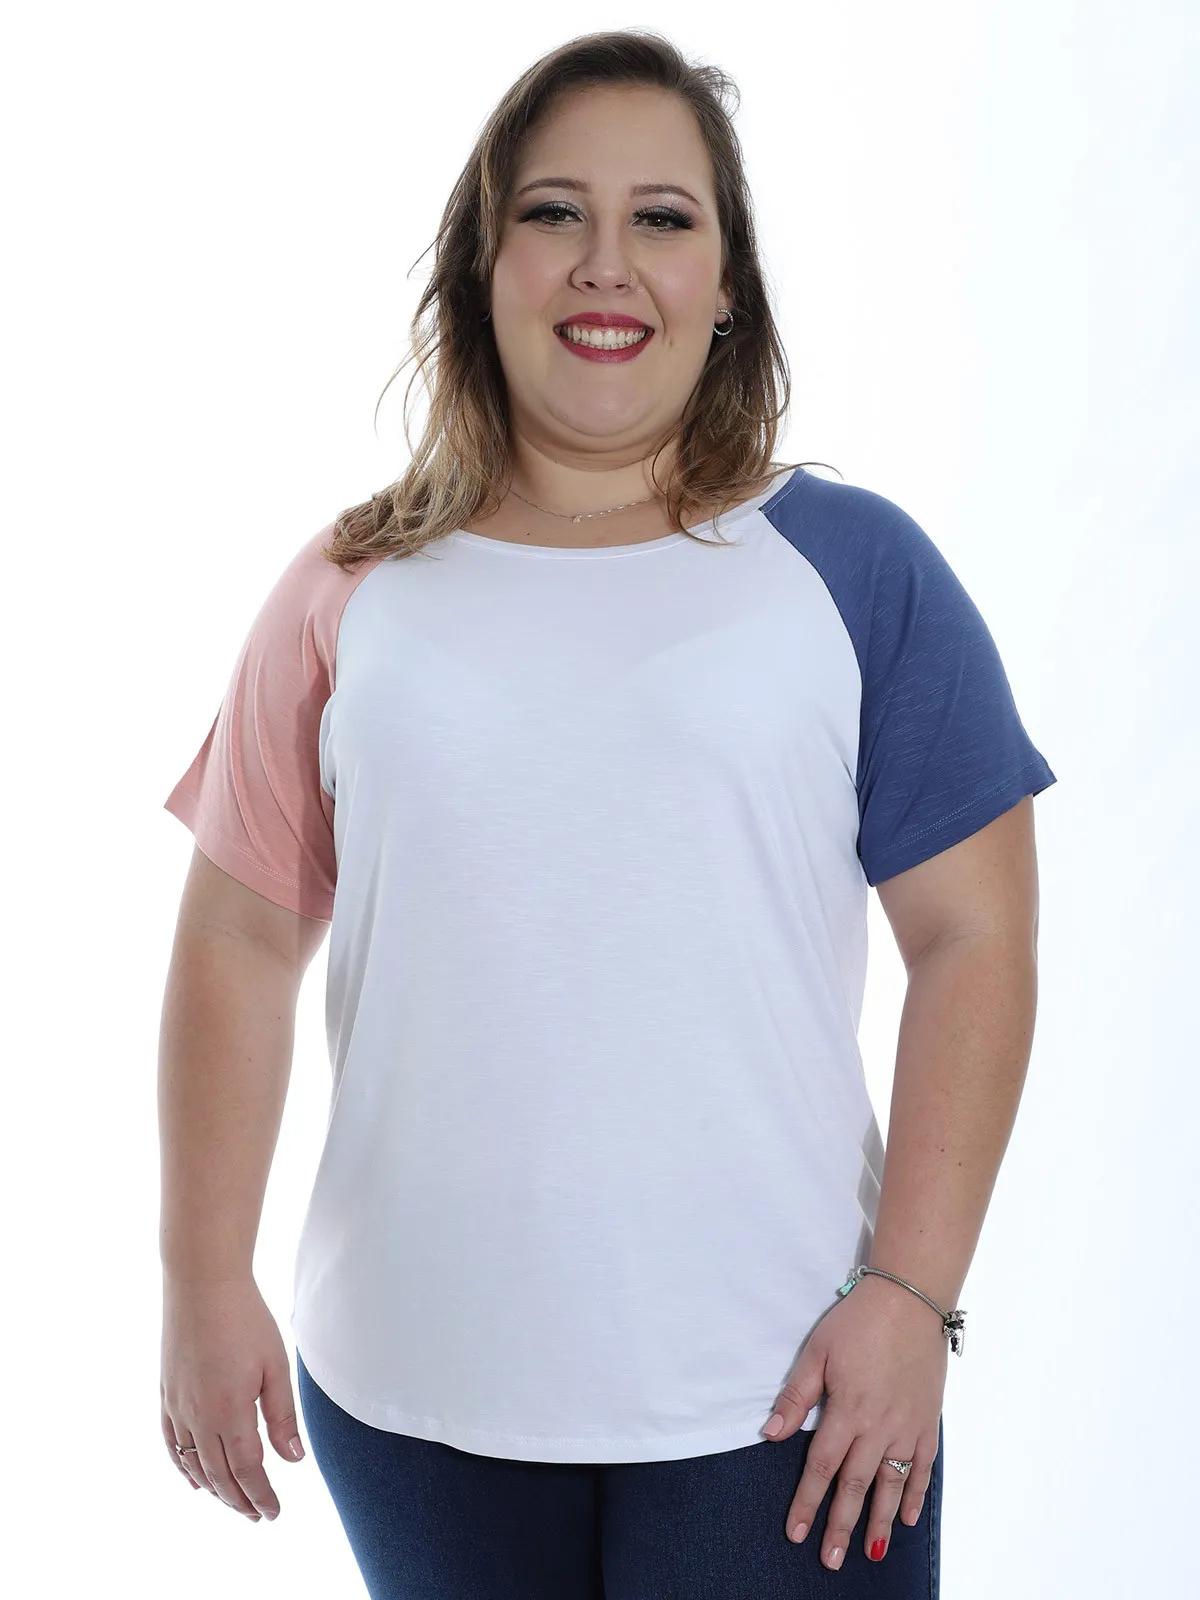 Blusa Plus Size Feminina Viscolycra Contraste Decote Redondo Branco